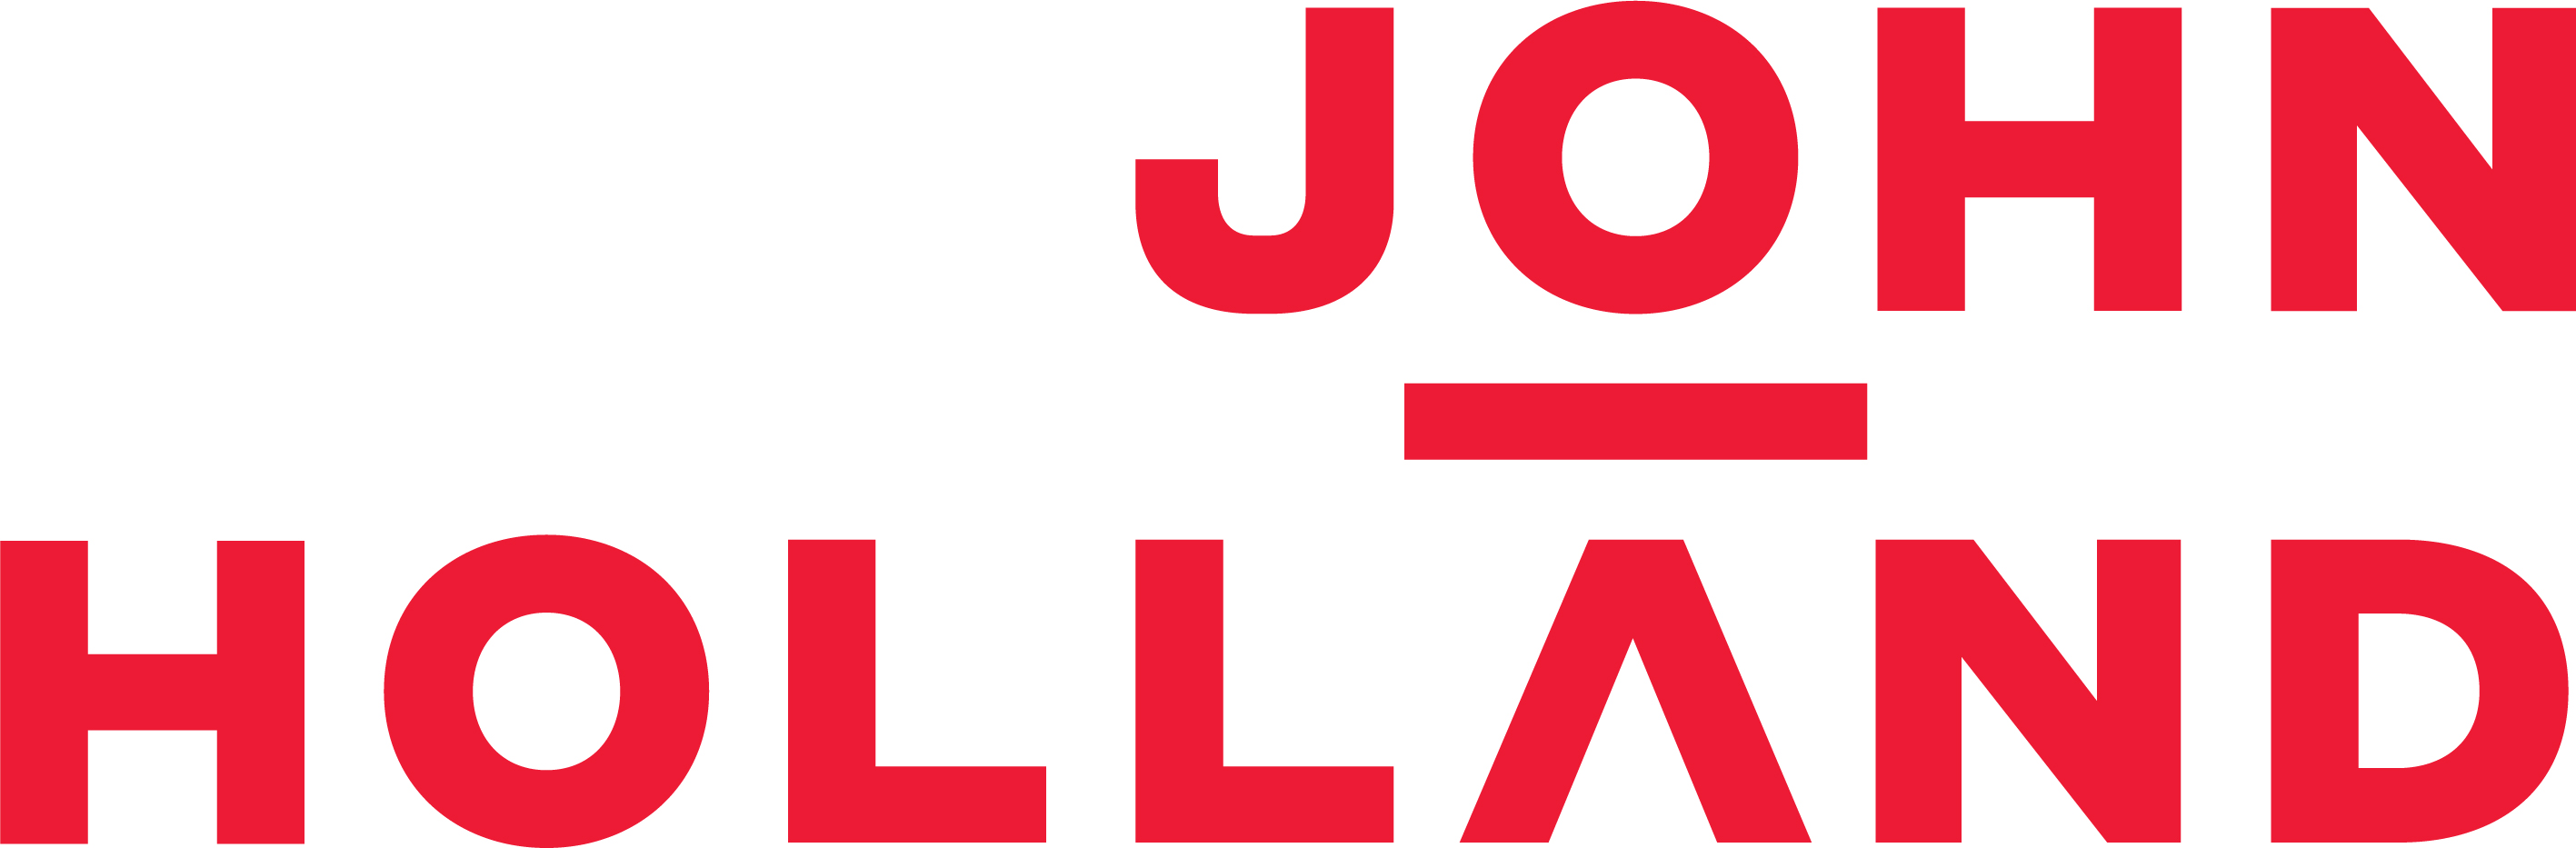 John Holland Melbourne